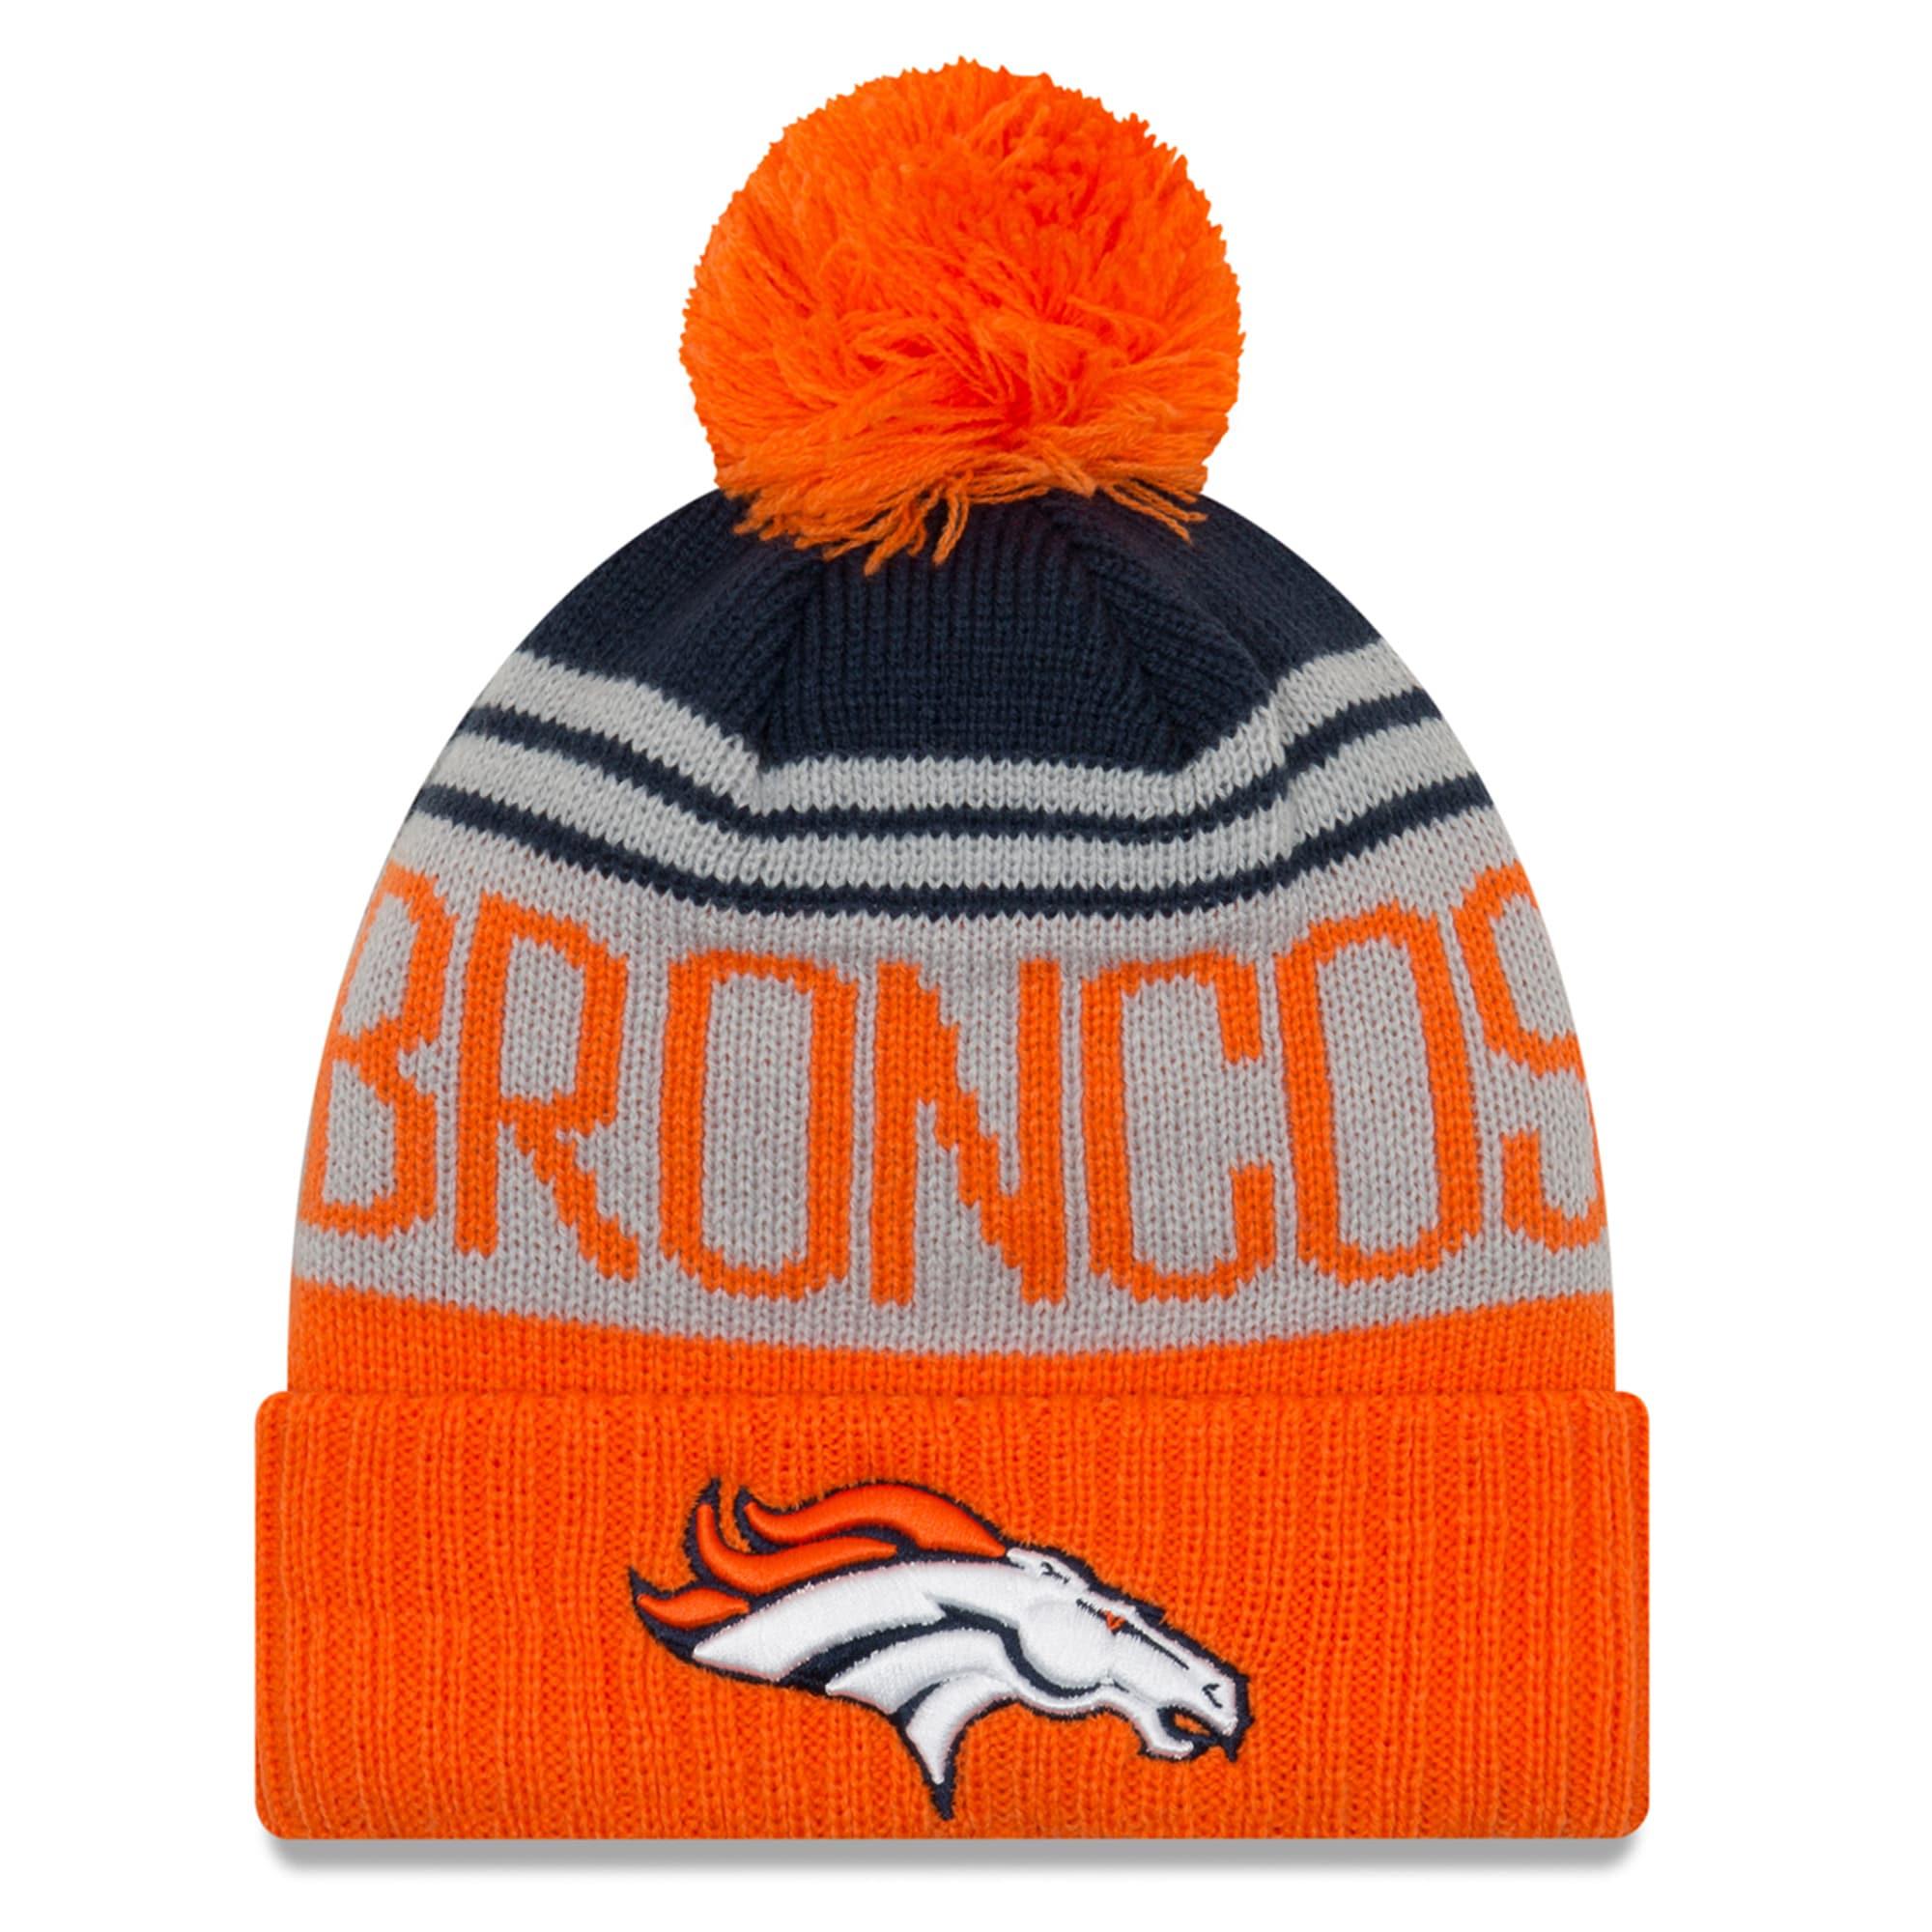 Denver Broncos New Era Team Pride Cuffed Knit Hat with Pom - Gray/Orange